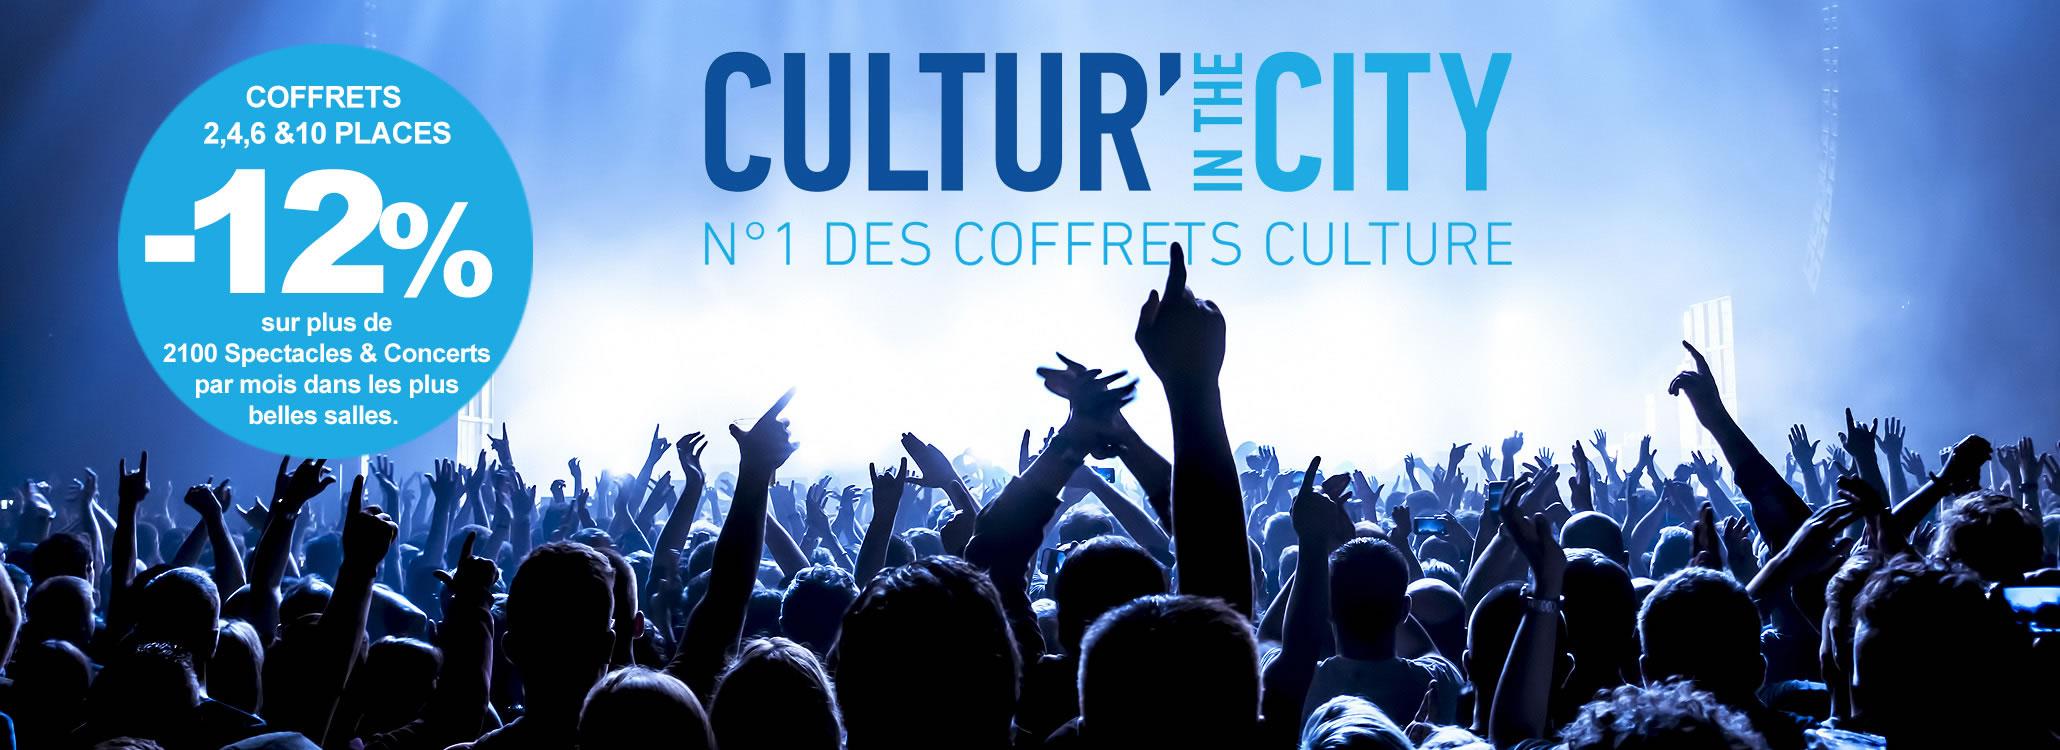 CULTUR-IN-THE-CITY-130821-2